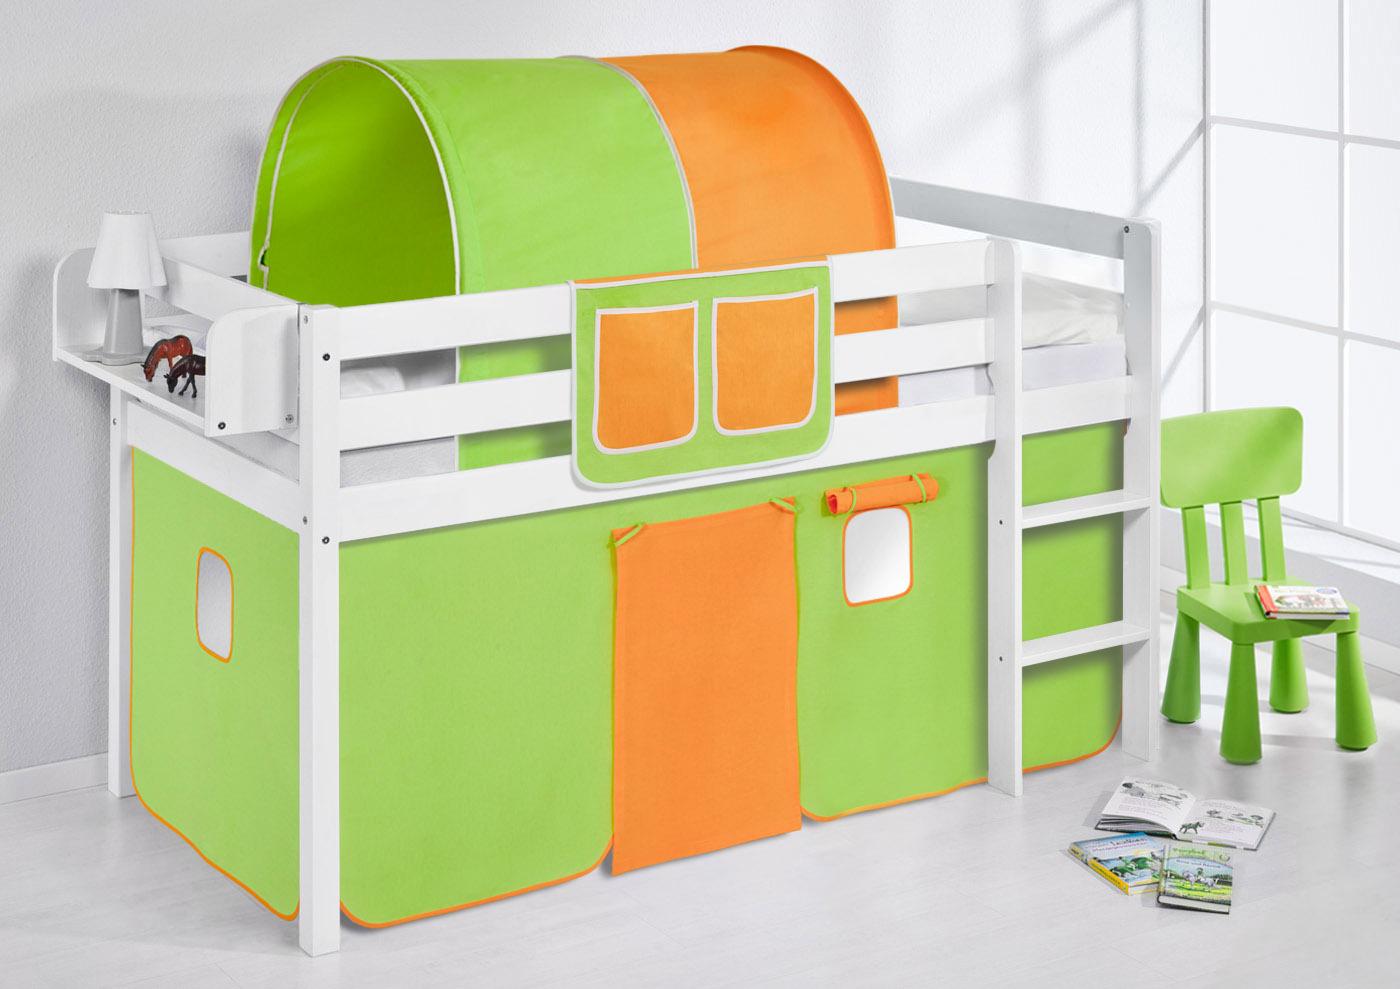 spielbett hochbett kinderbett jelle mit vorhang neu lilokids ebay. Black Bedroom Furniture Sets. Home Design Ideas